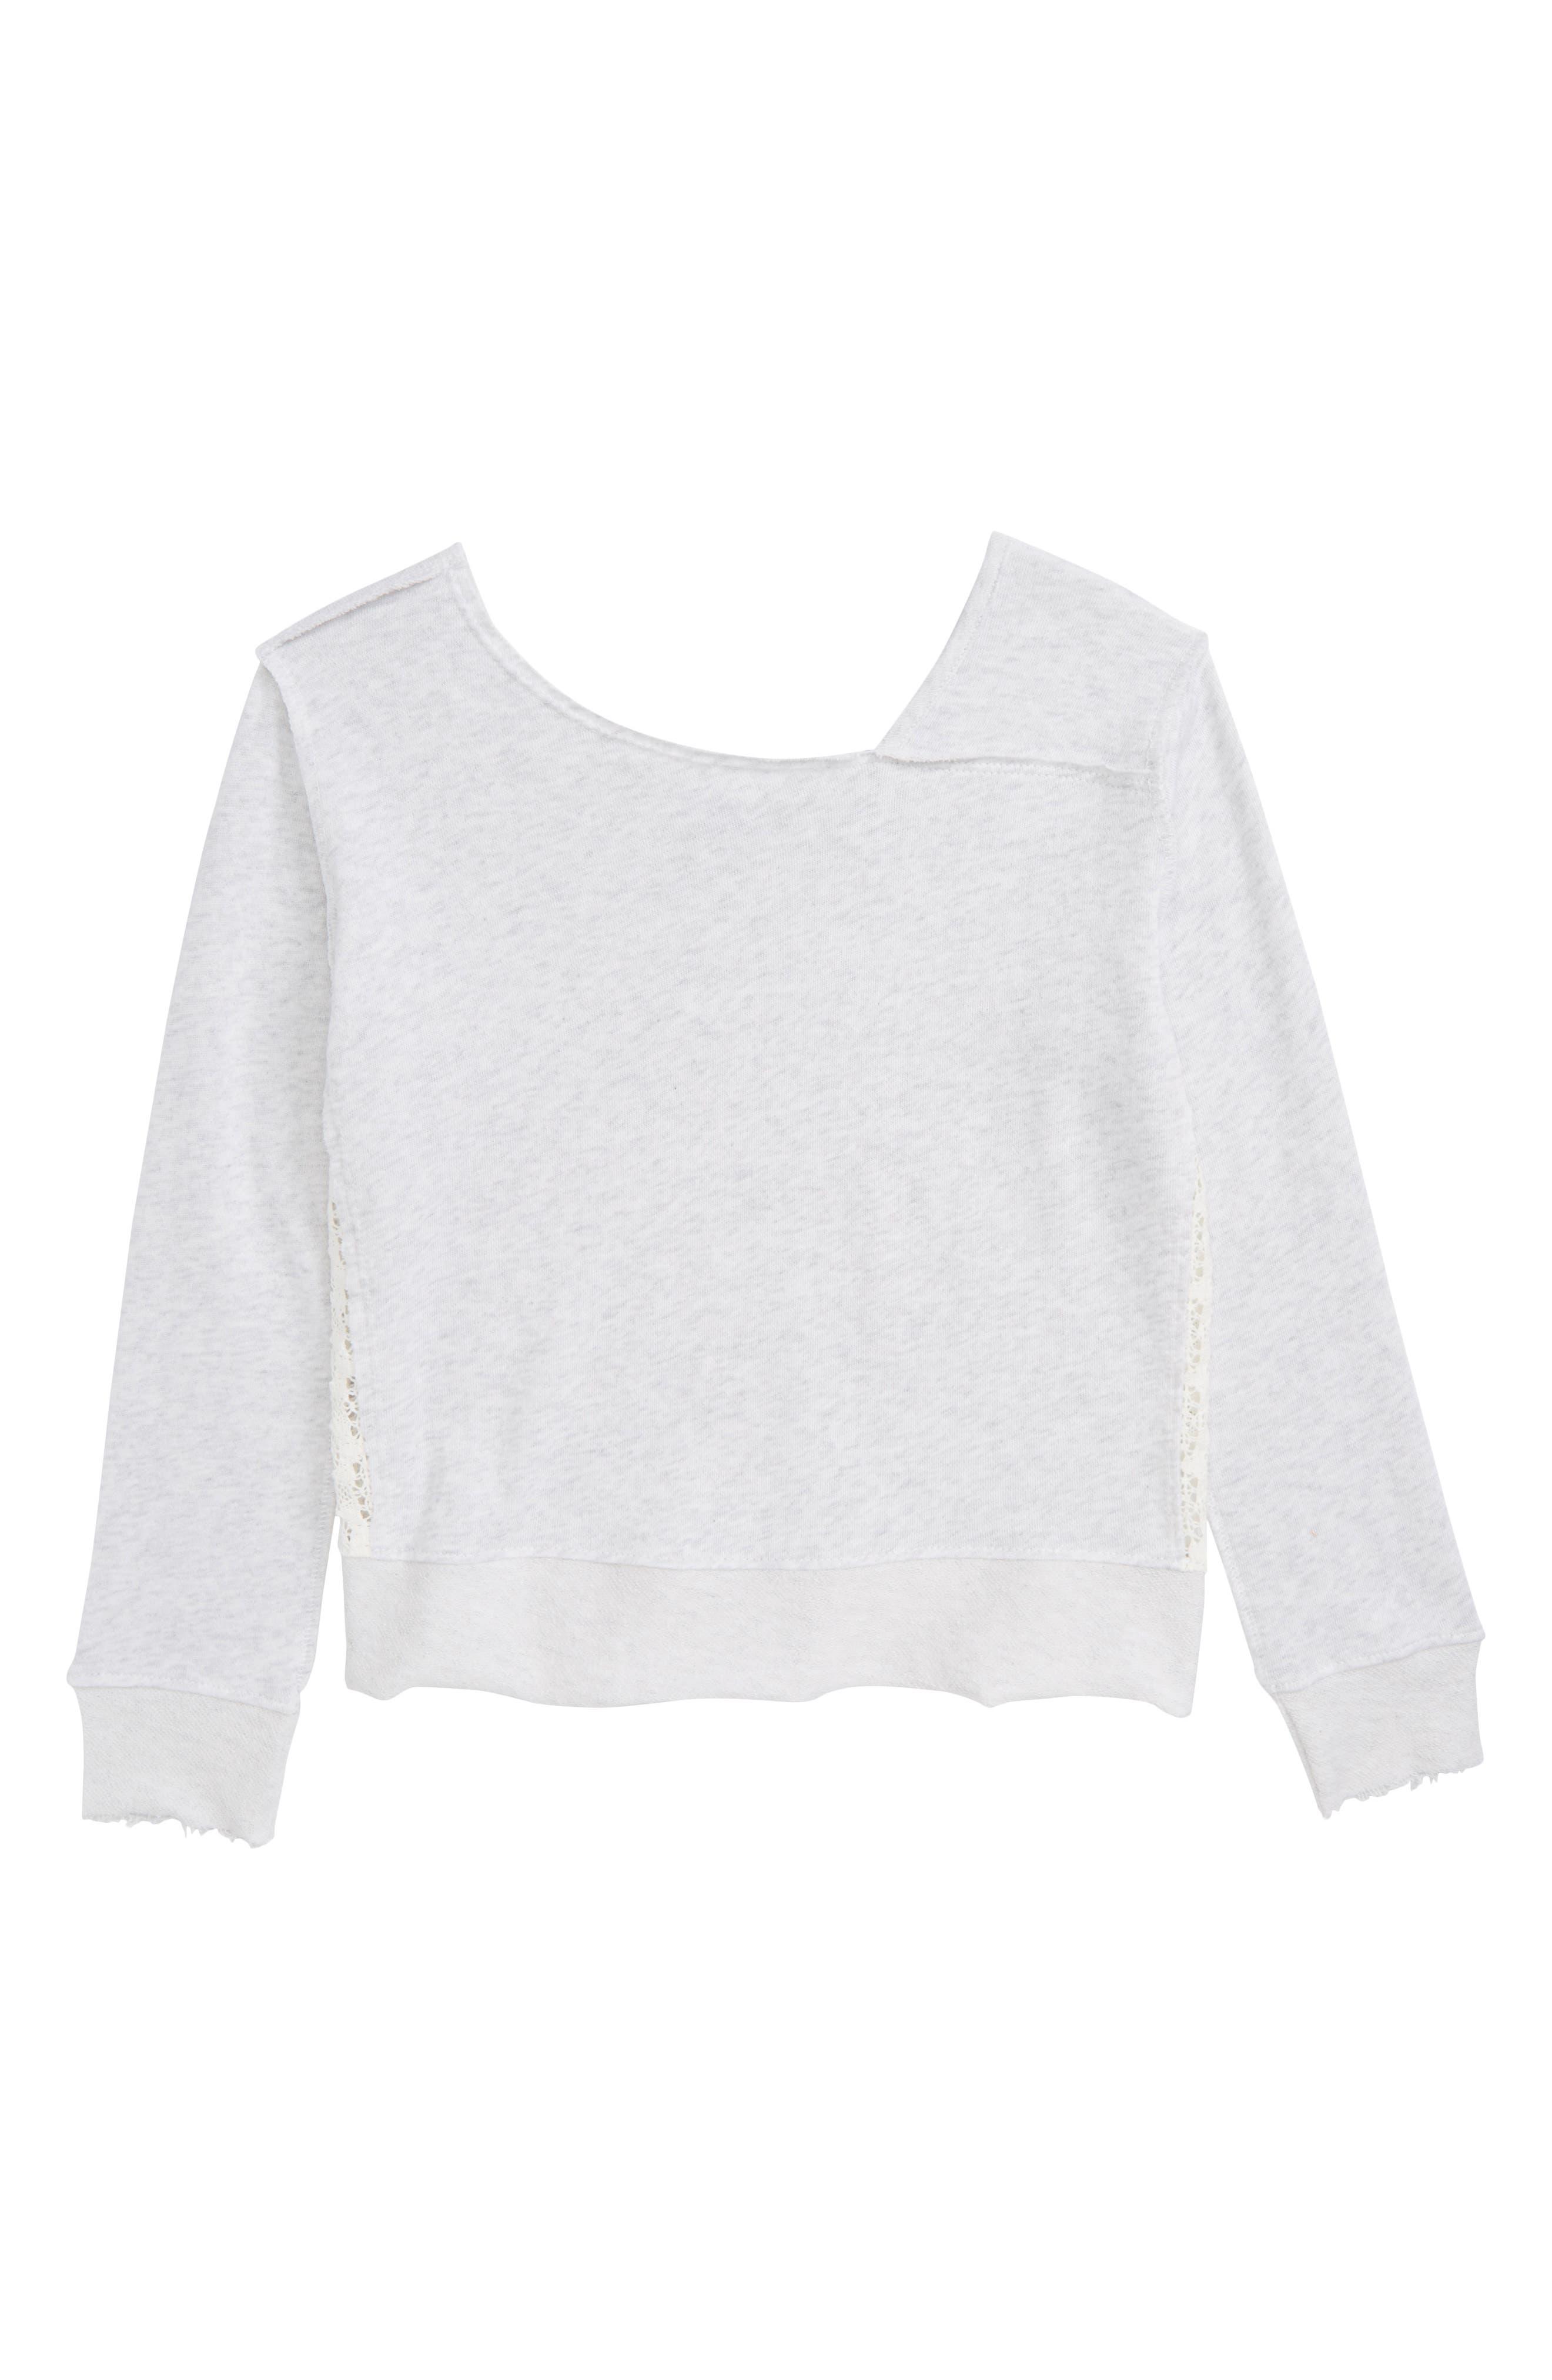 Lace Inset Sweatshirt,                         Main,                         color, Light Grey Heather